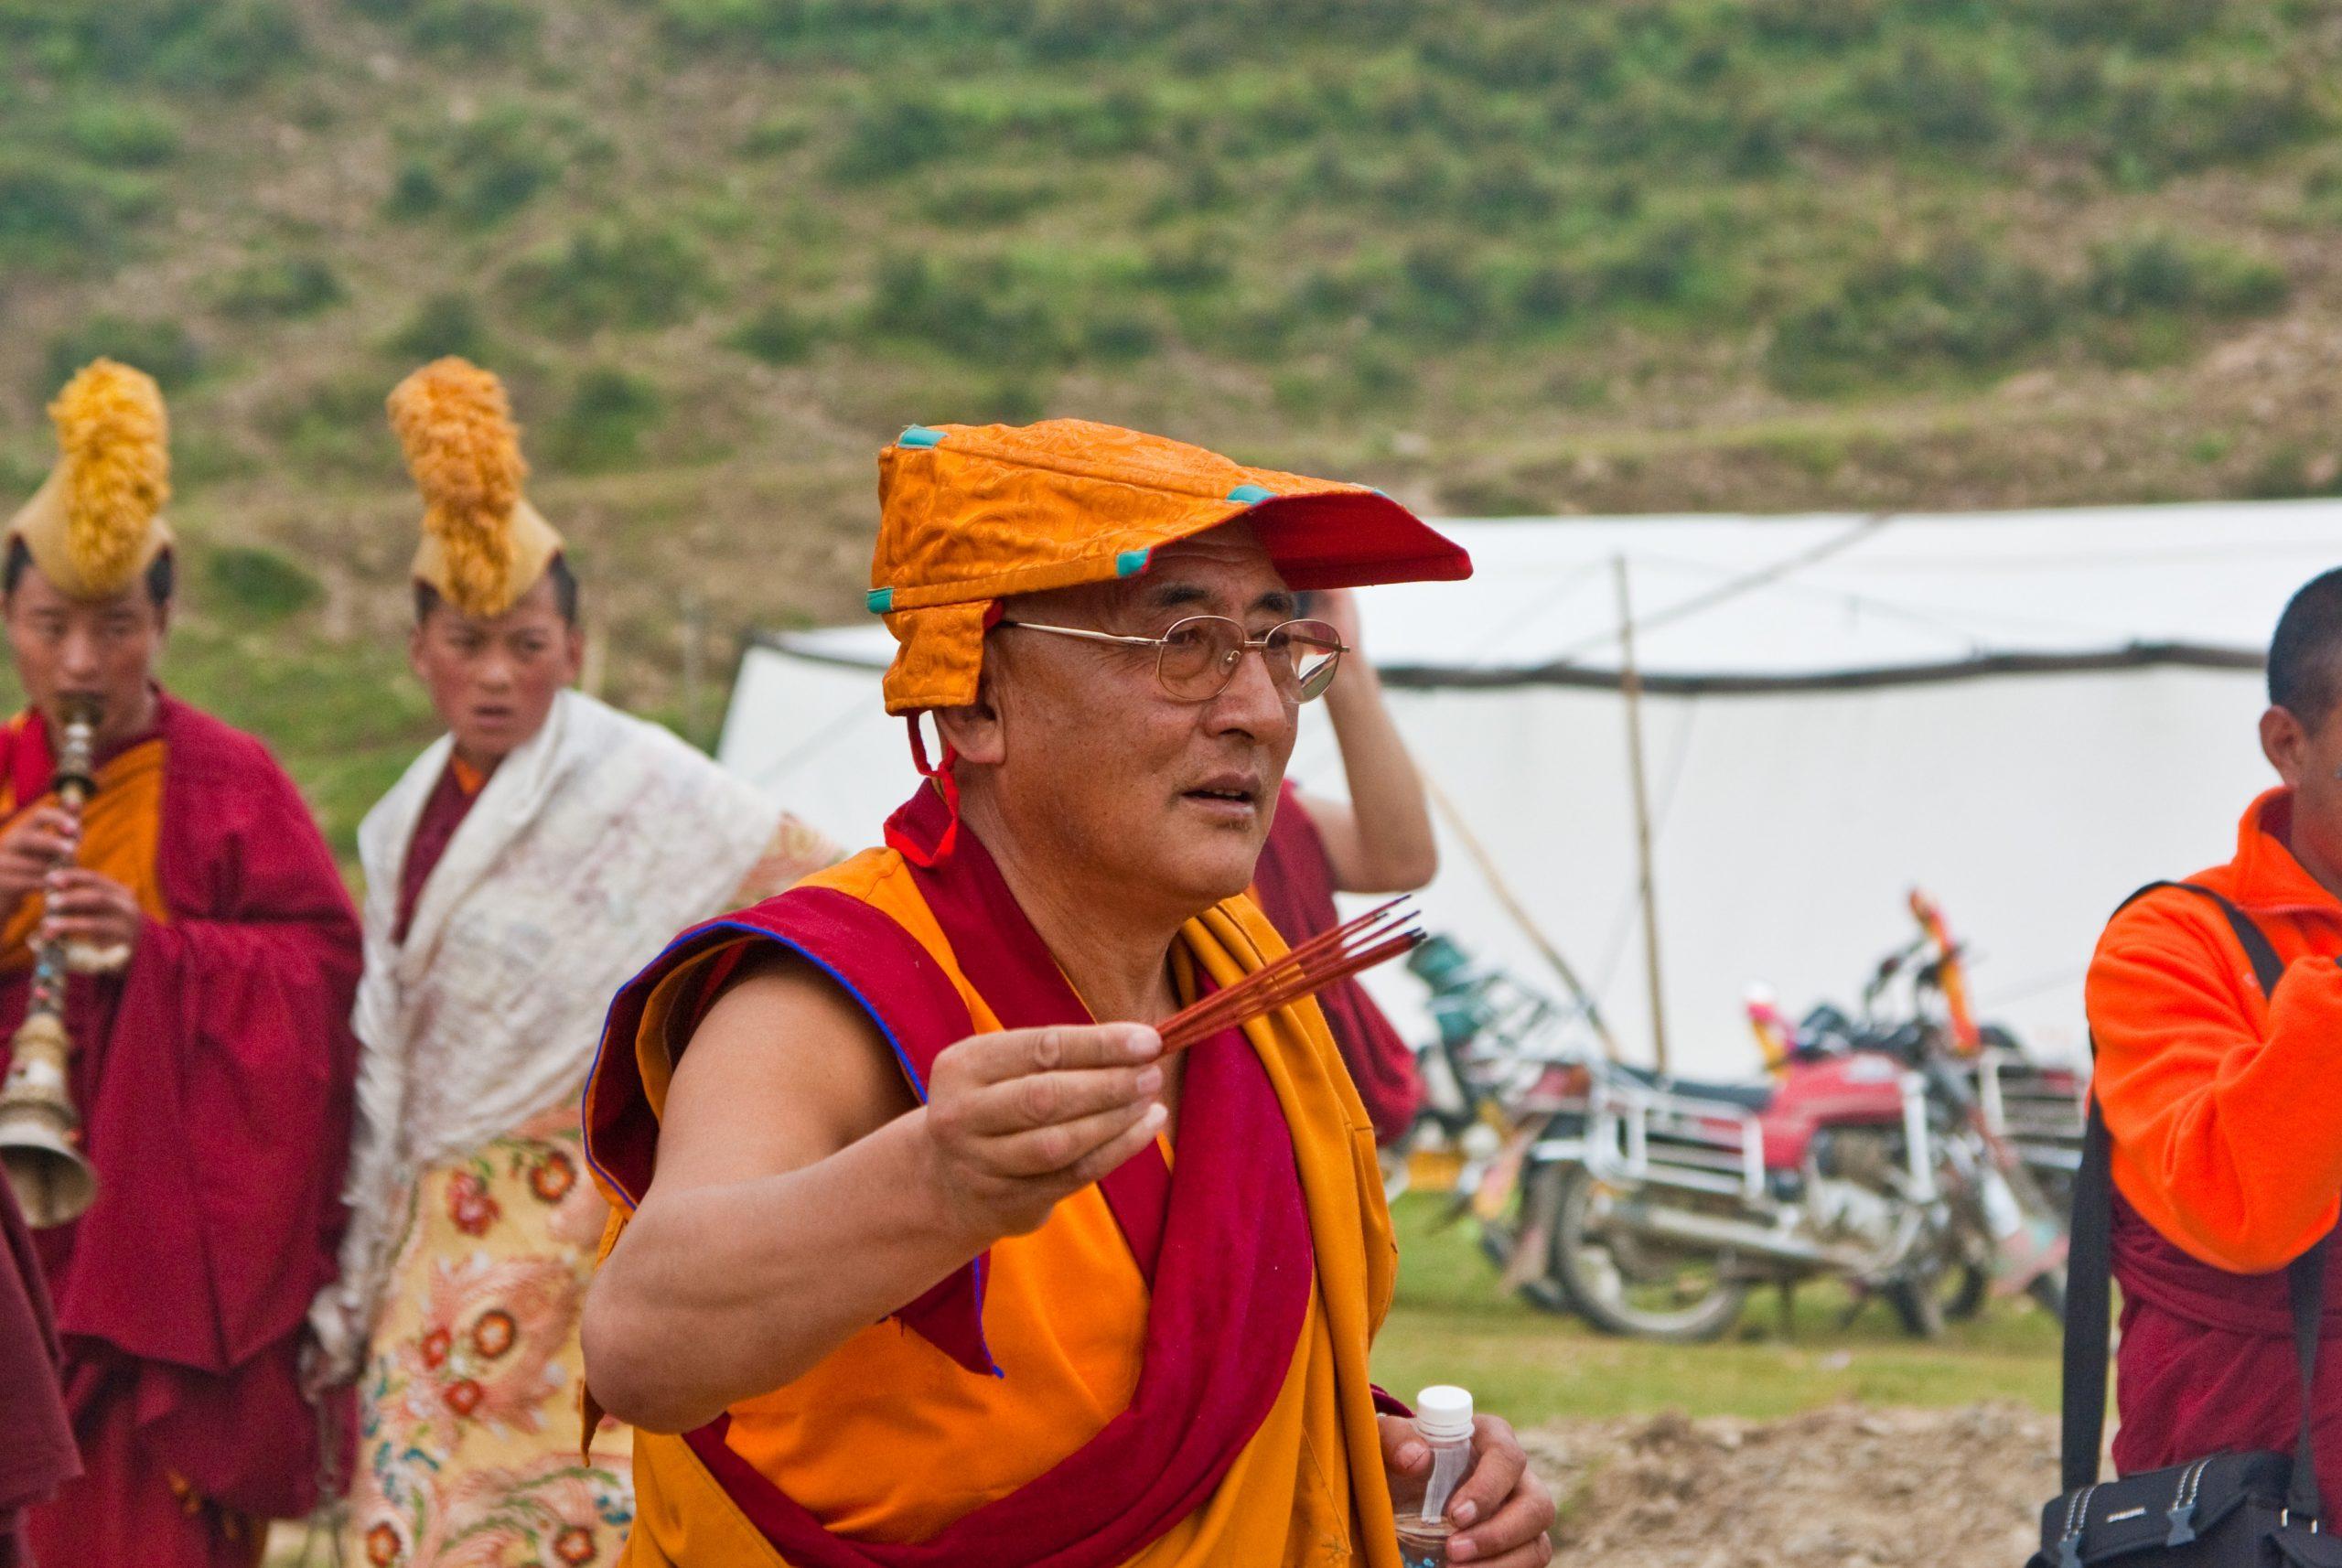 Tibet's Tragedy – The Extinction of the Dalai Lama